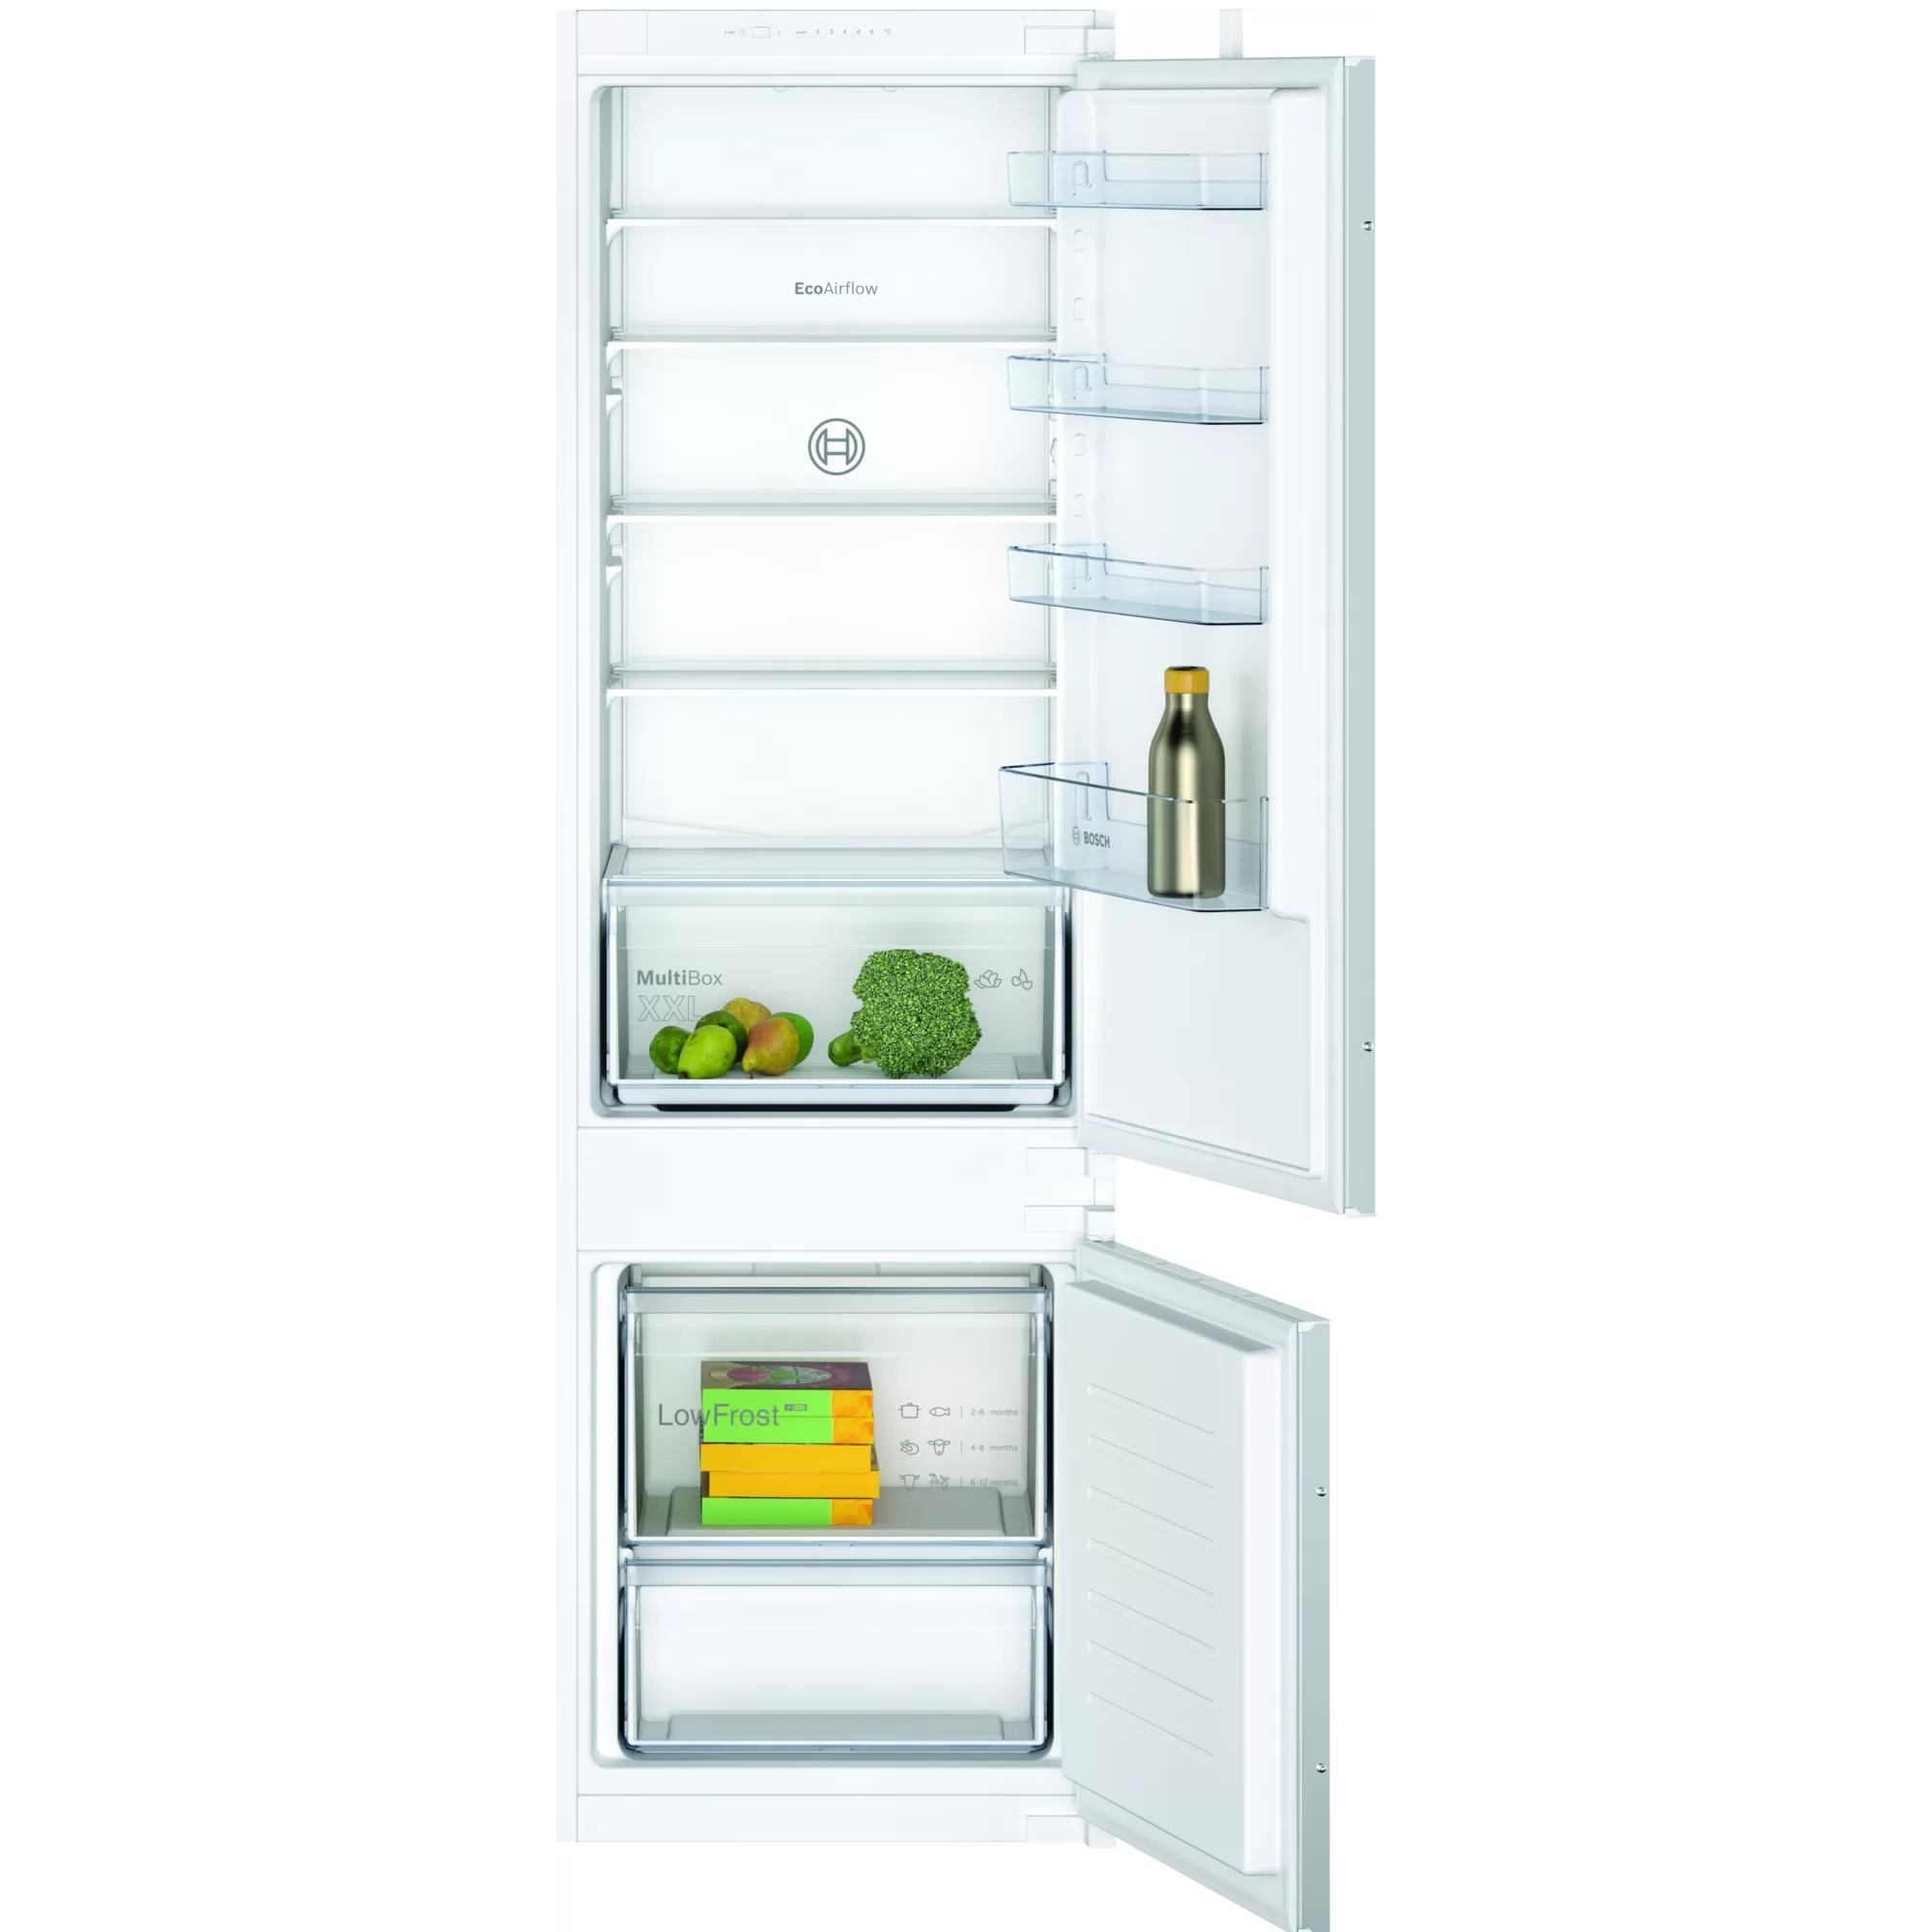 Bosch ugradni frižider KIV87NSF0 - Inelektronik